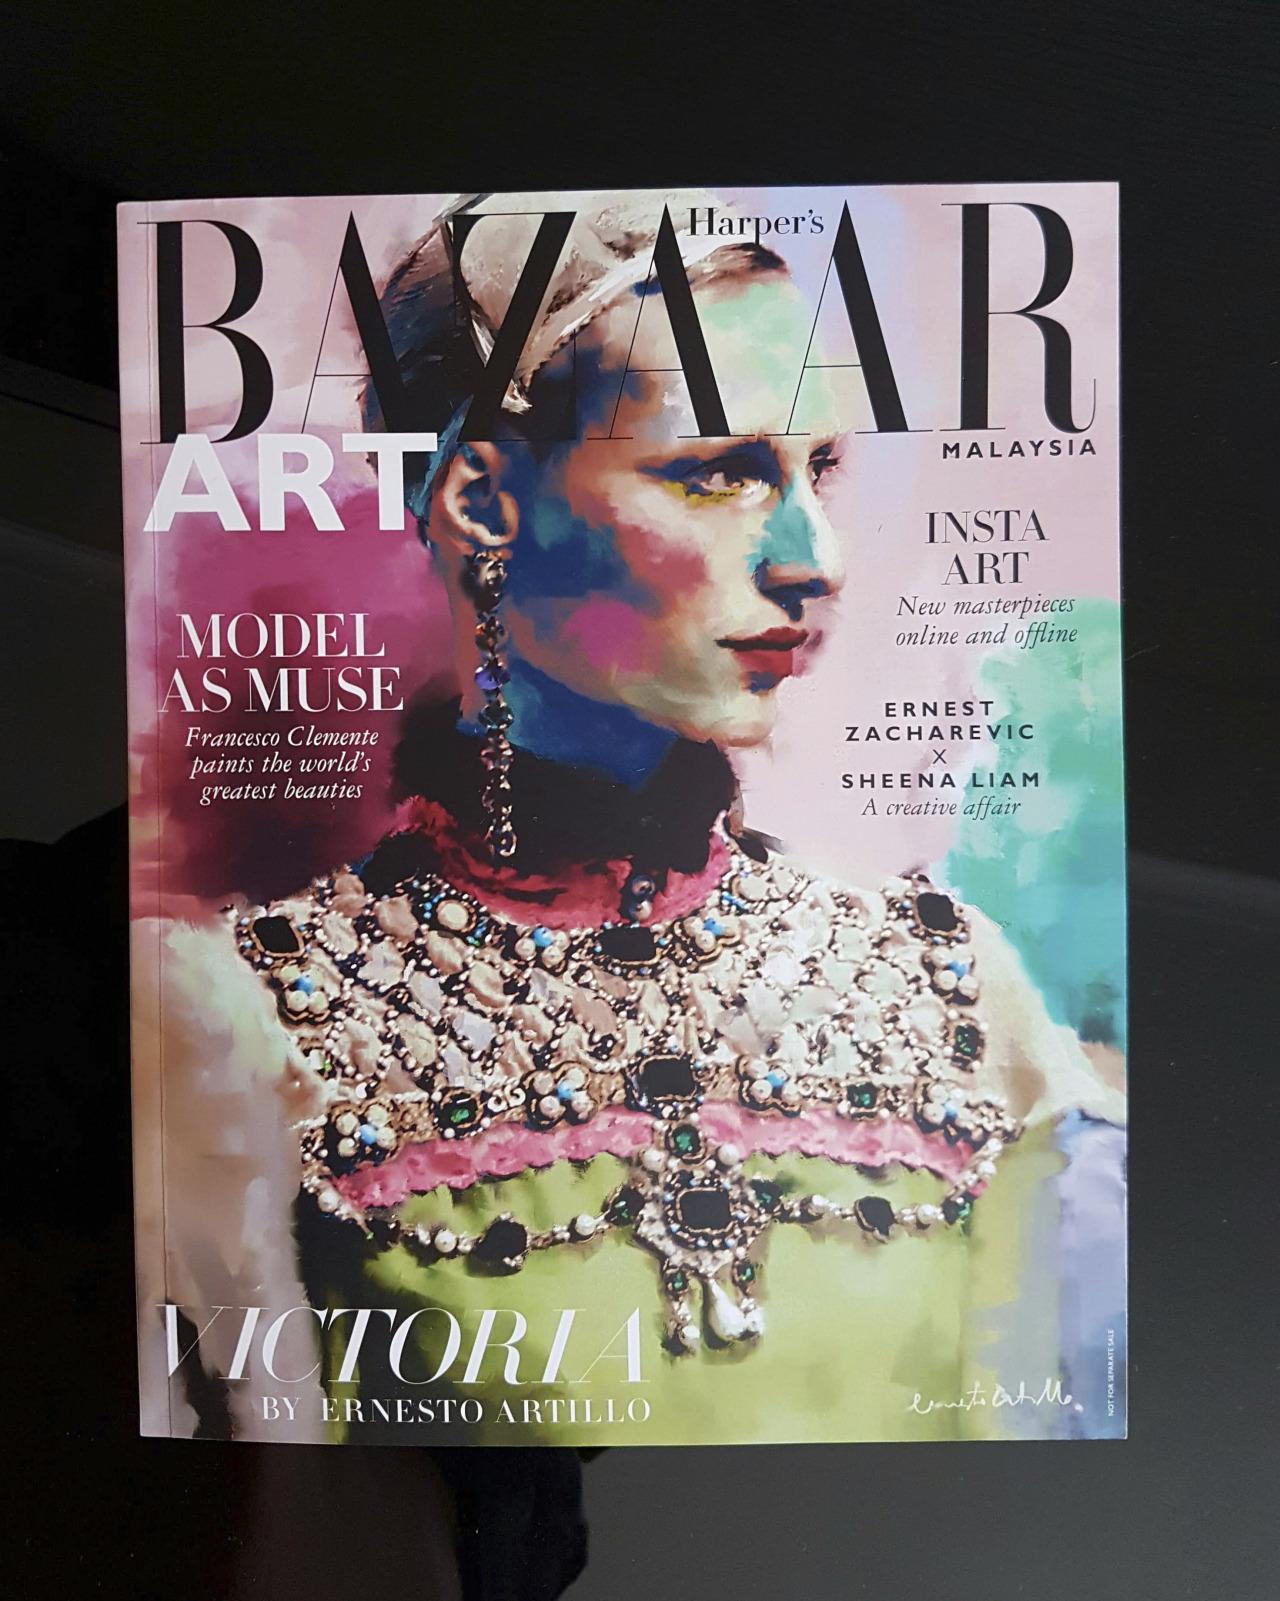 Harper's Bazaar Art Malasia